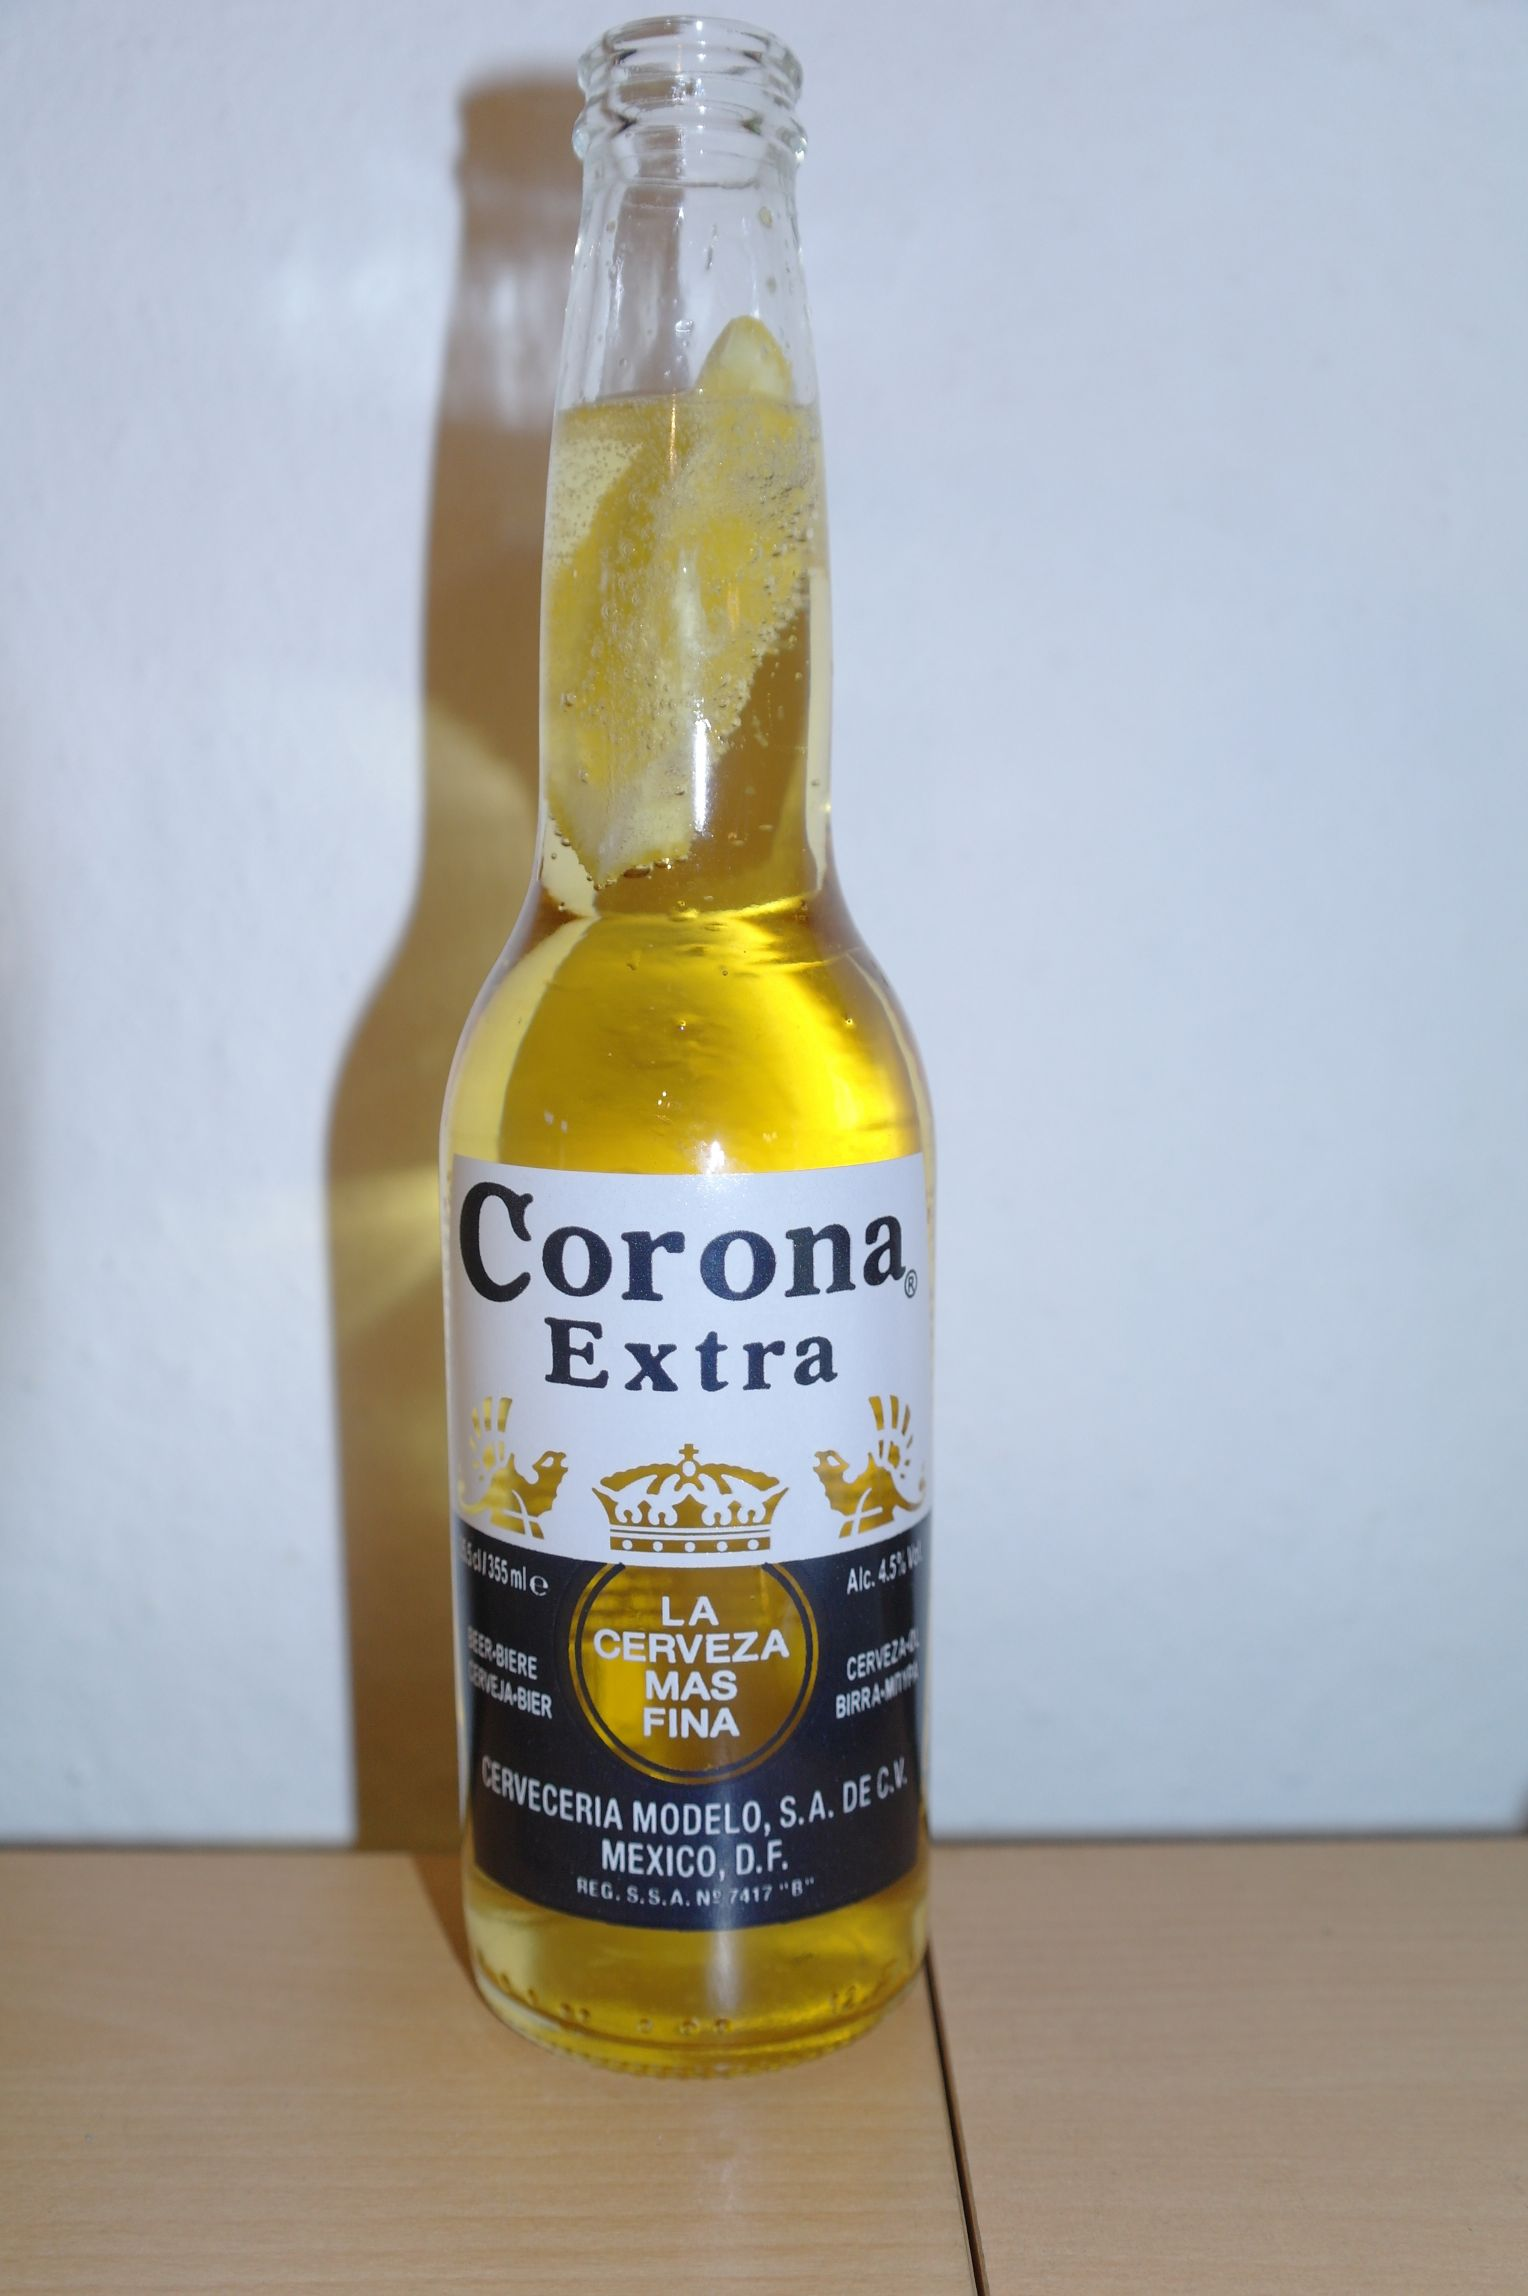 Corona Testers Voltage Tester 12250v Ac Dc Diagnostic Circuit Extra Die Bier